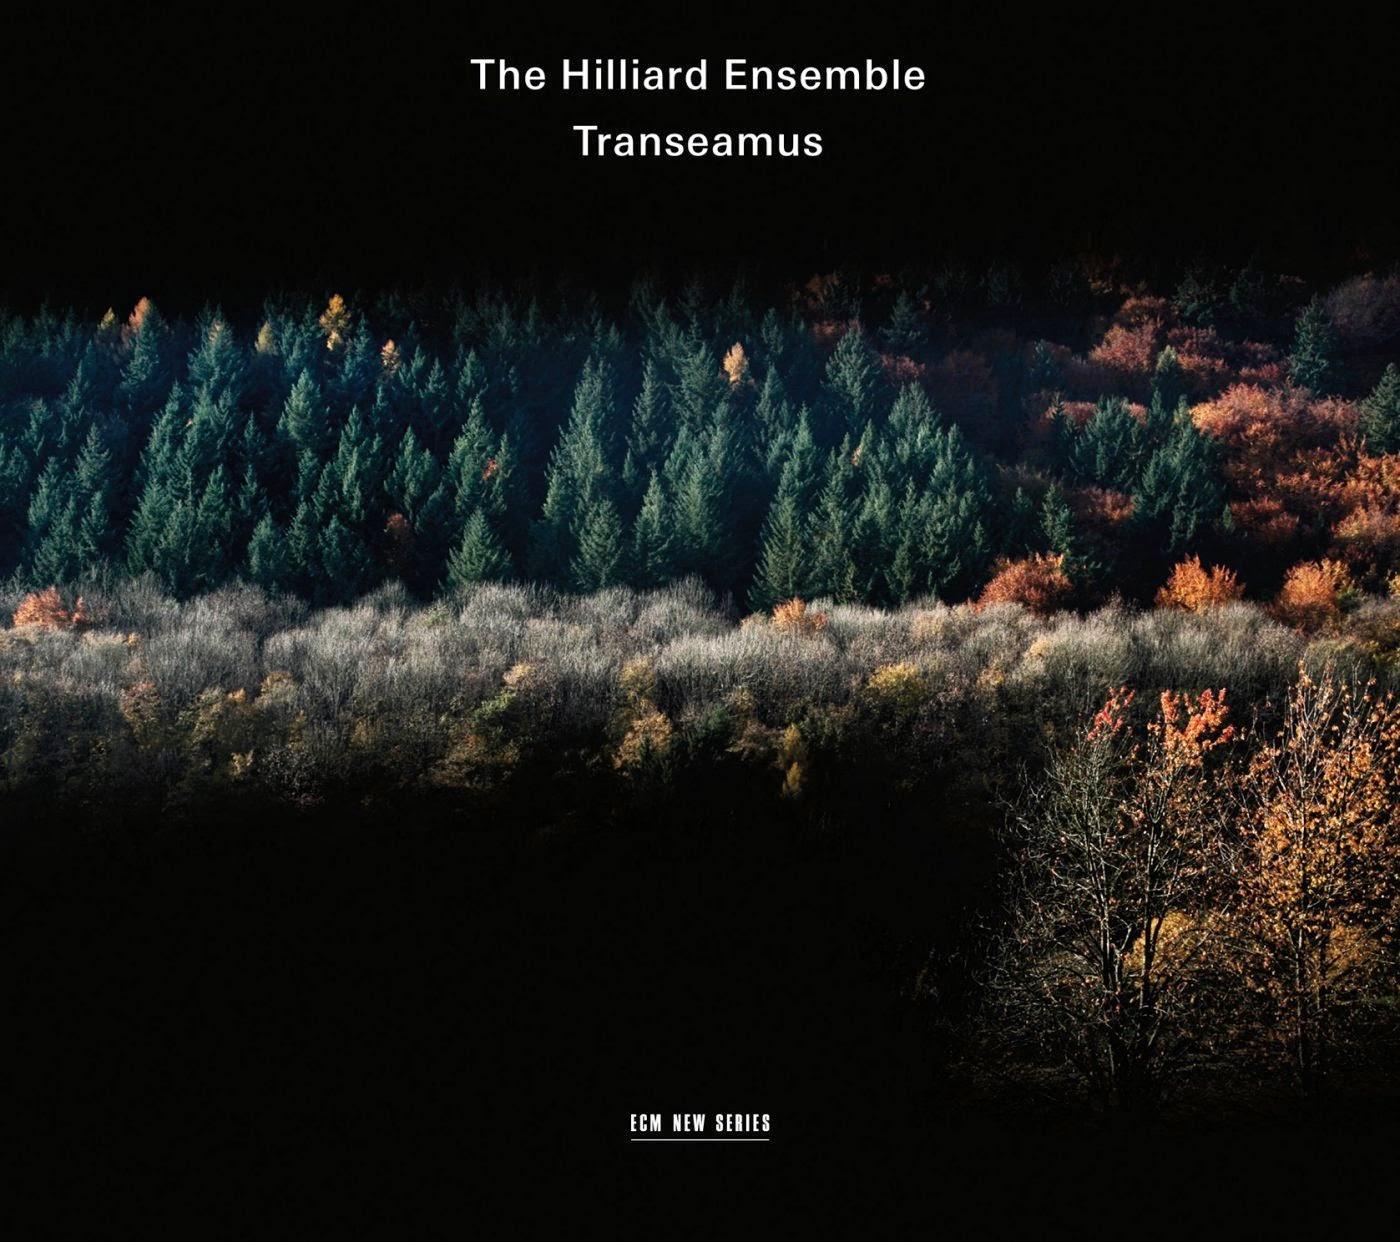 Transeamus - The Hilliard Ensemble